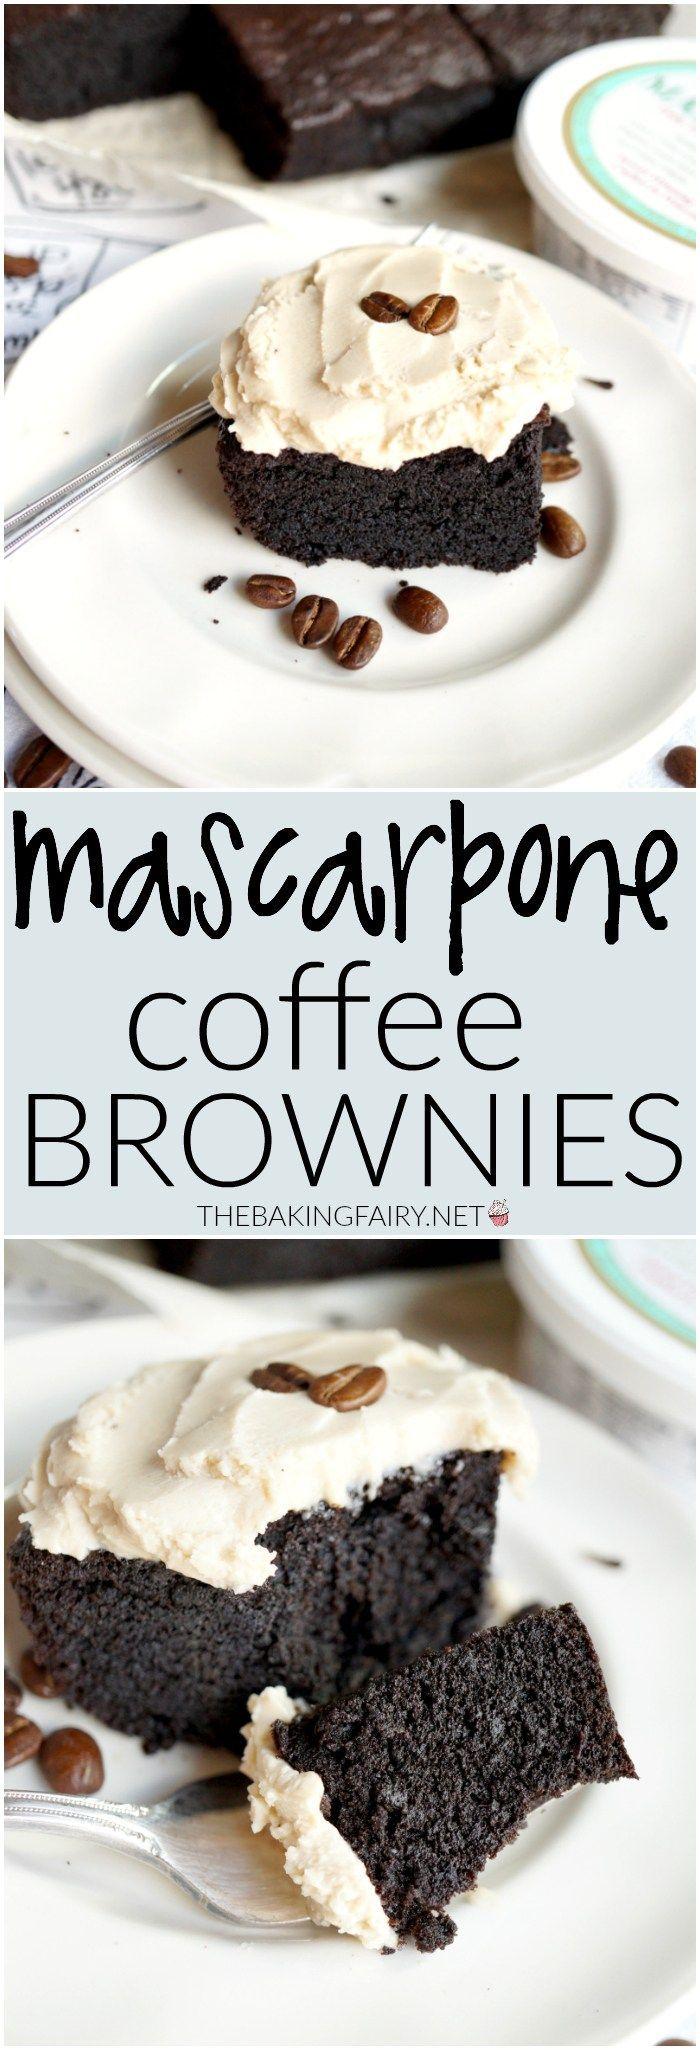 Mascarpone coffee brownies Recipe Coffee brownies